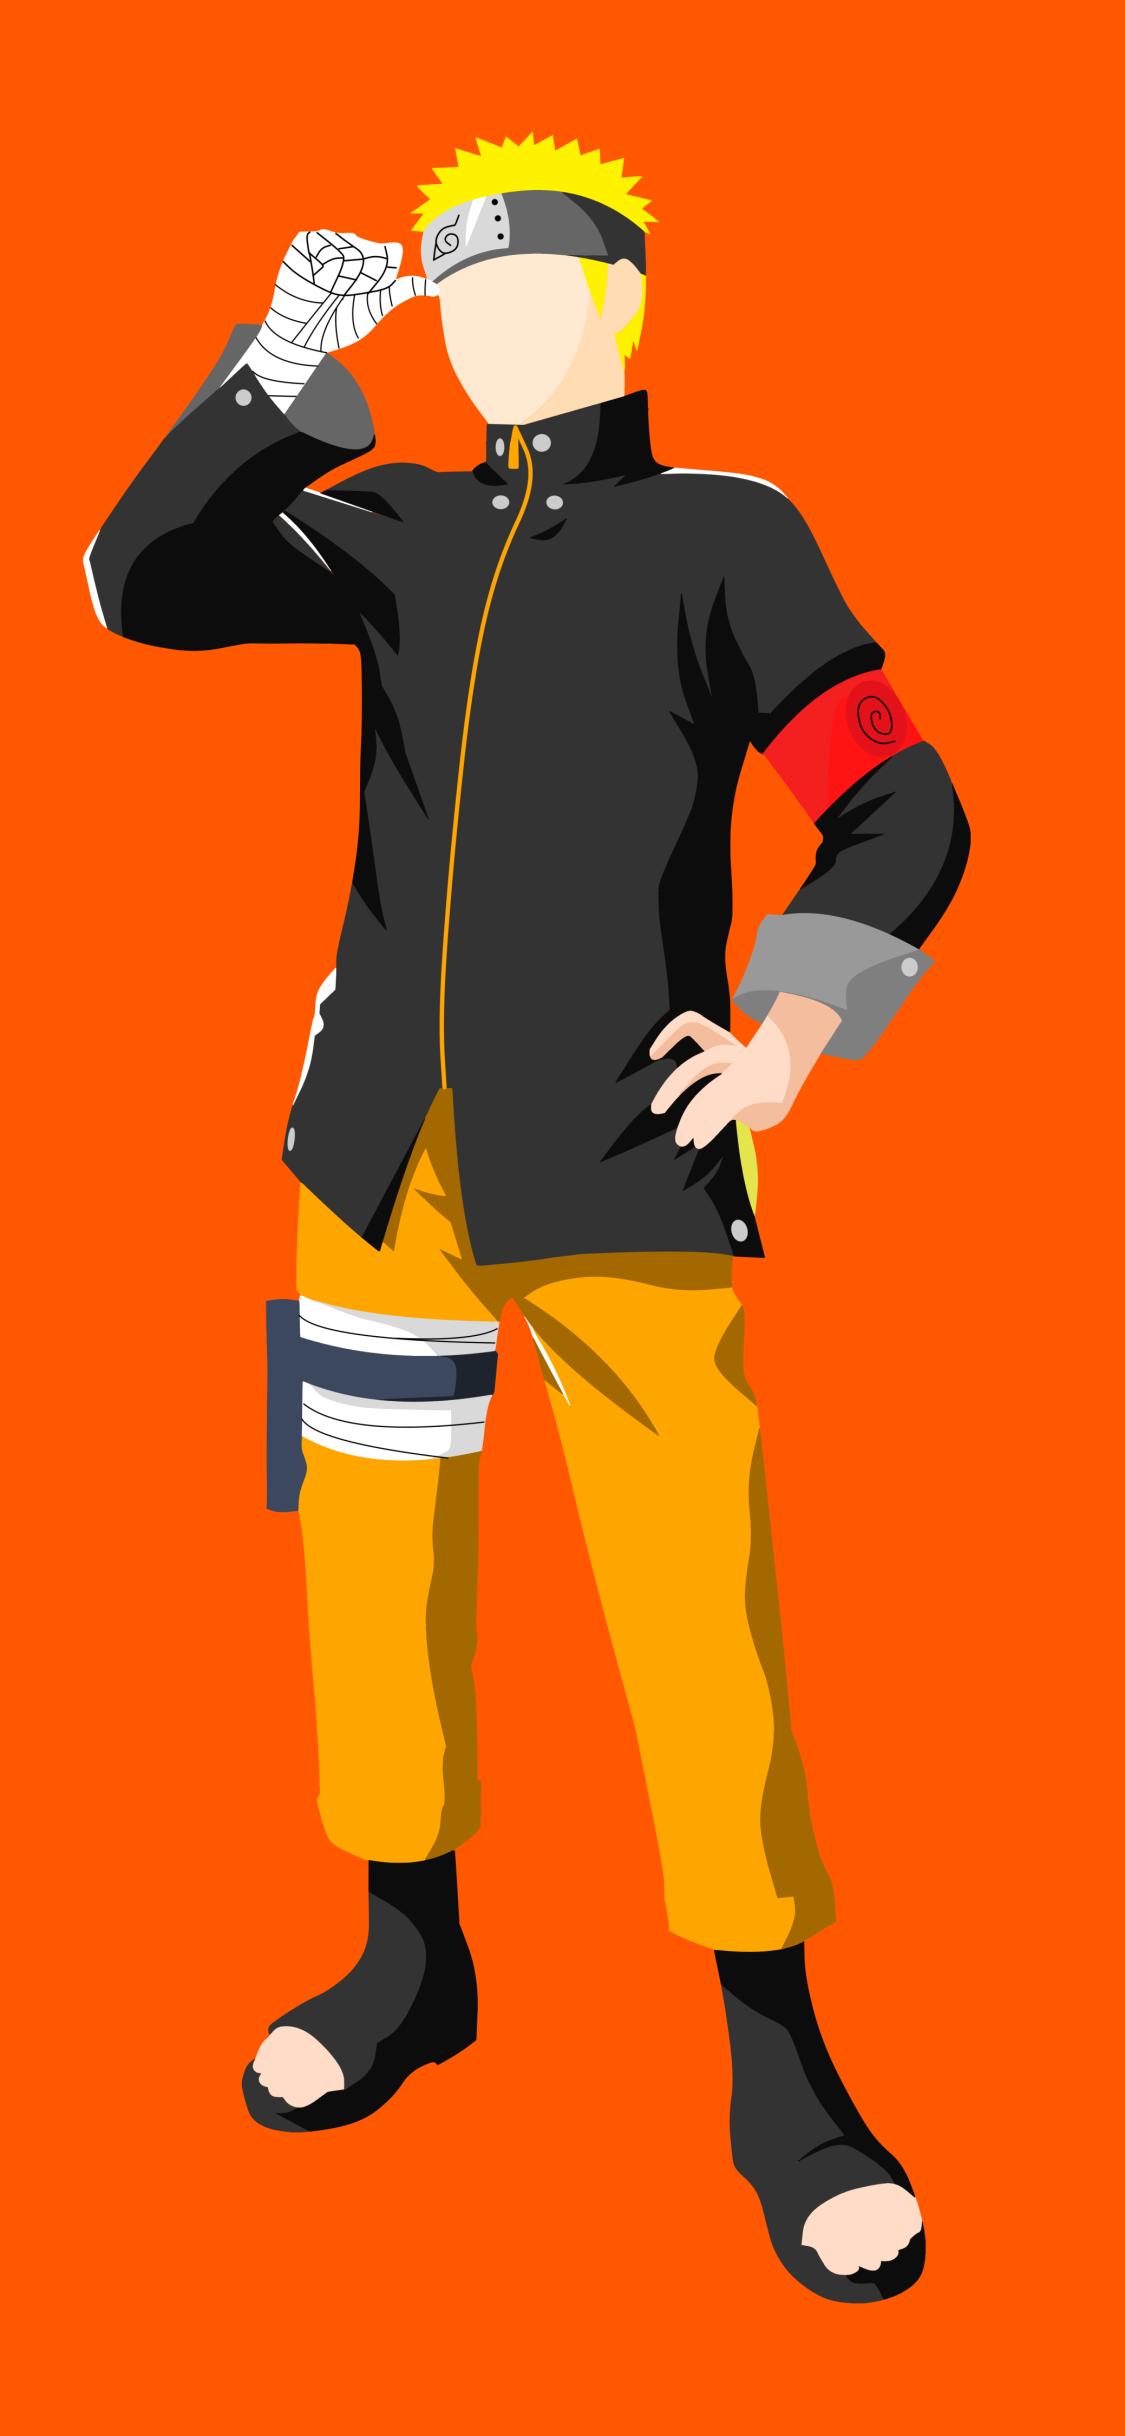 Naruto uzumaki minimalist mobile wallpaper